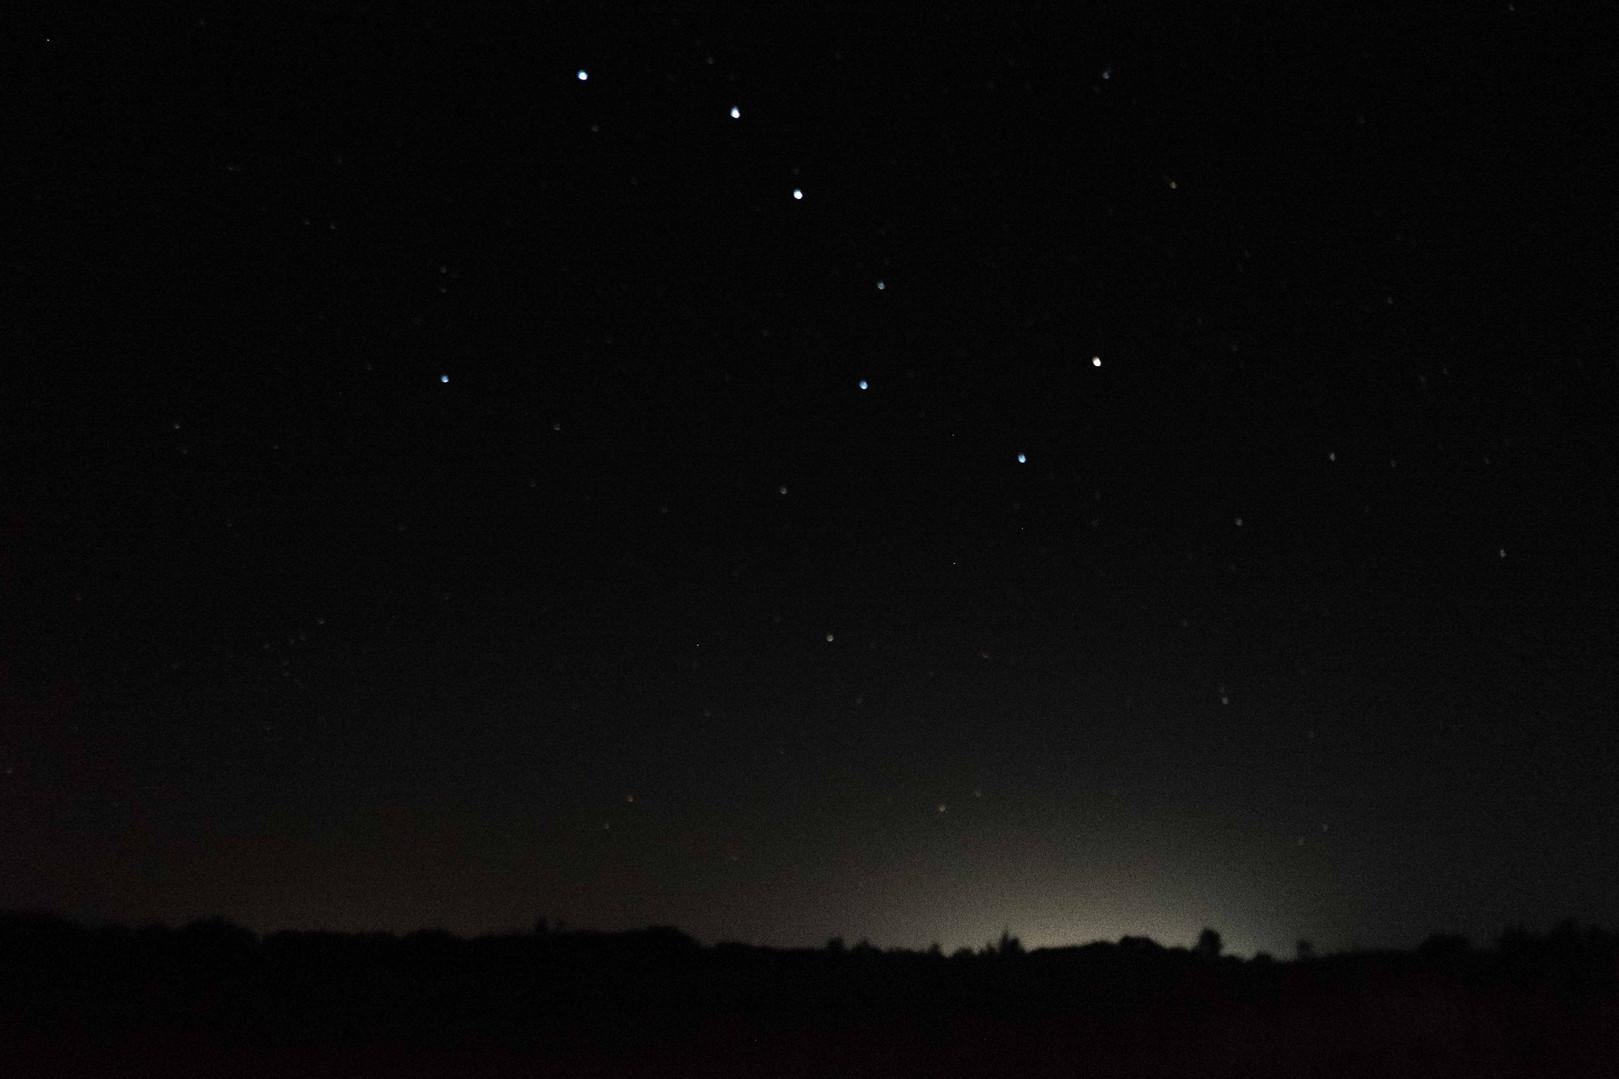 Starring nights - the Big Dipper-3253.jp